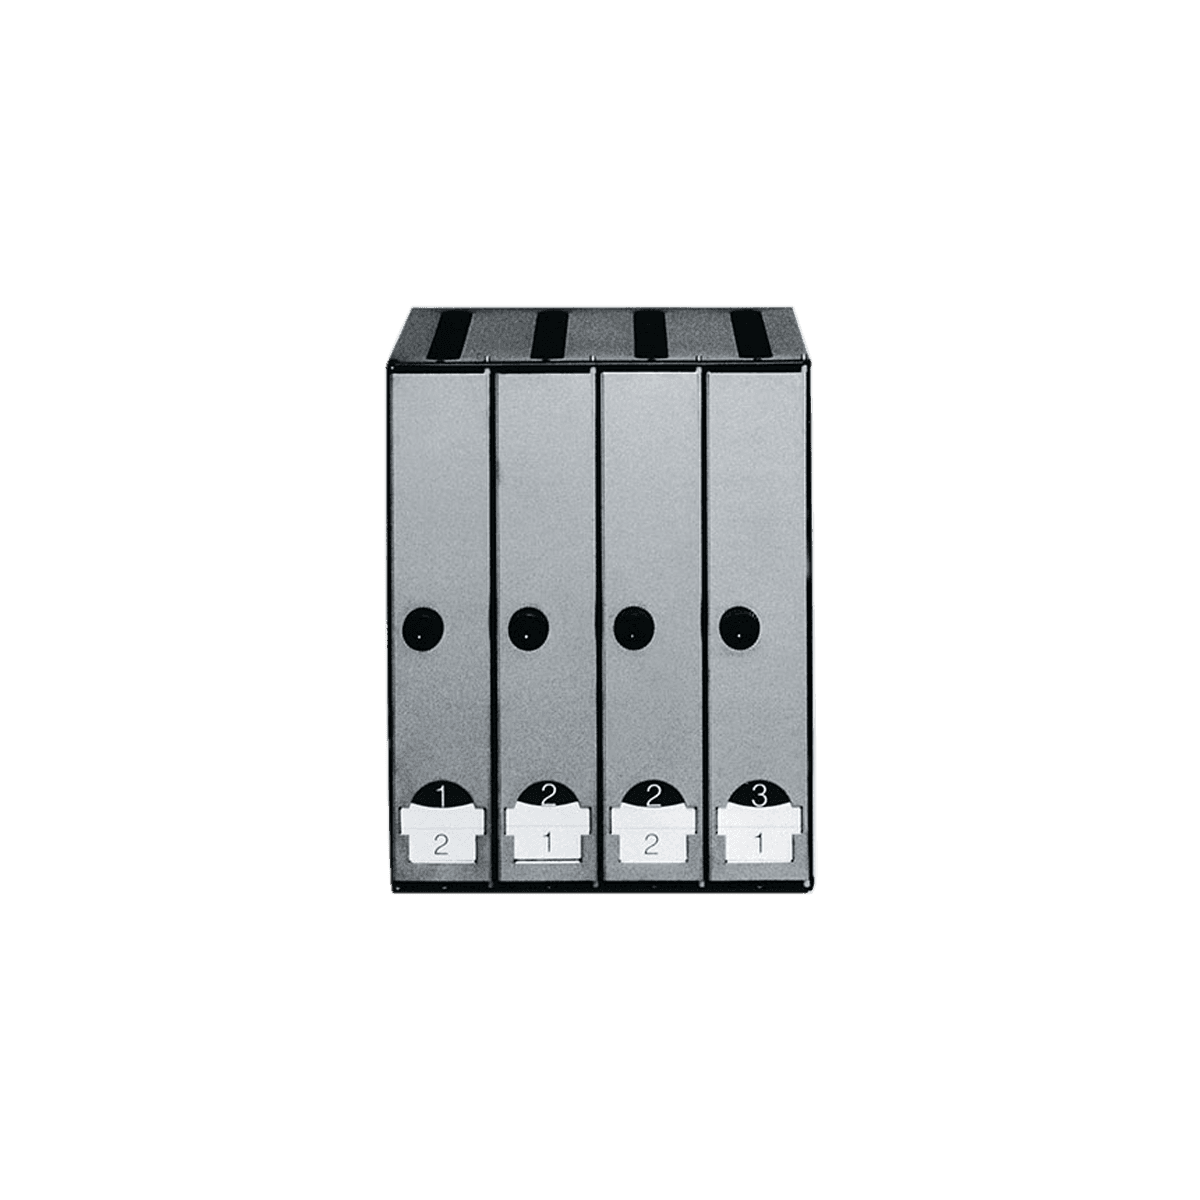 b.d barcelona design 3-4-5 Mailbox 邮箱